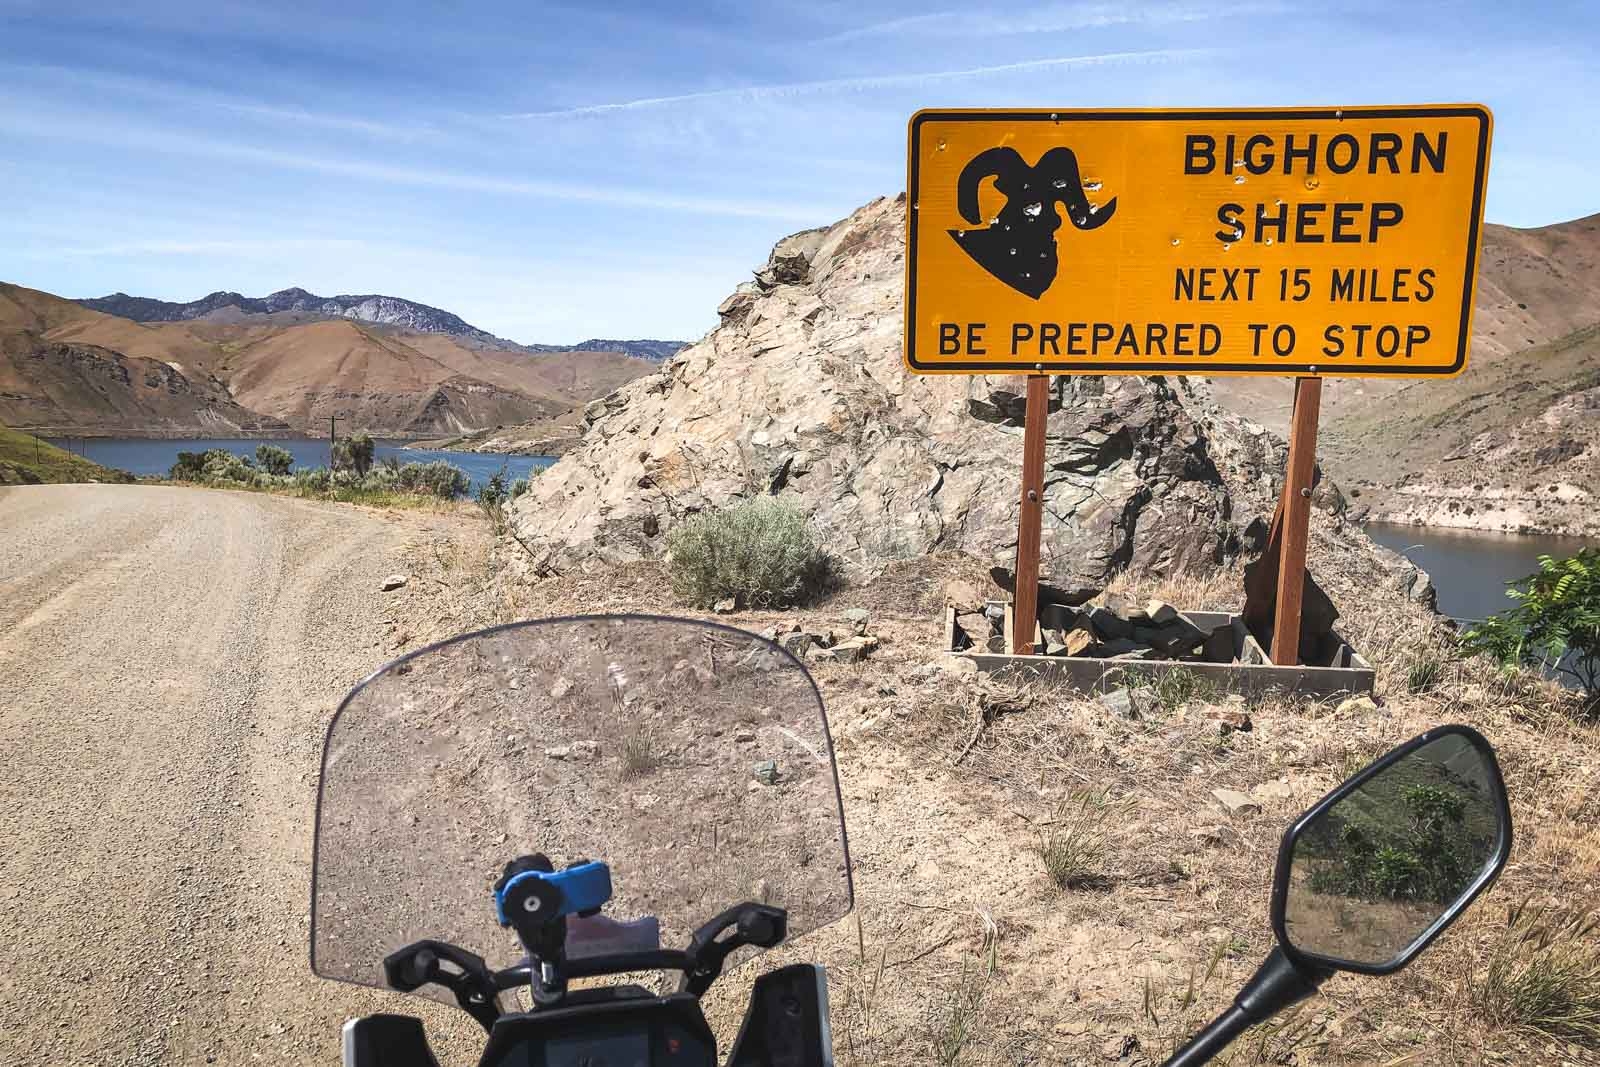 adventure_motorcycle_tour_bighorn_sheep